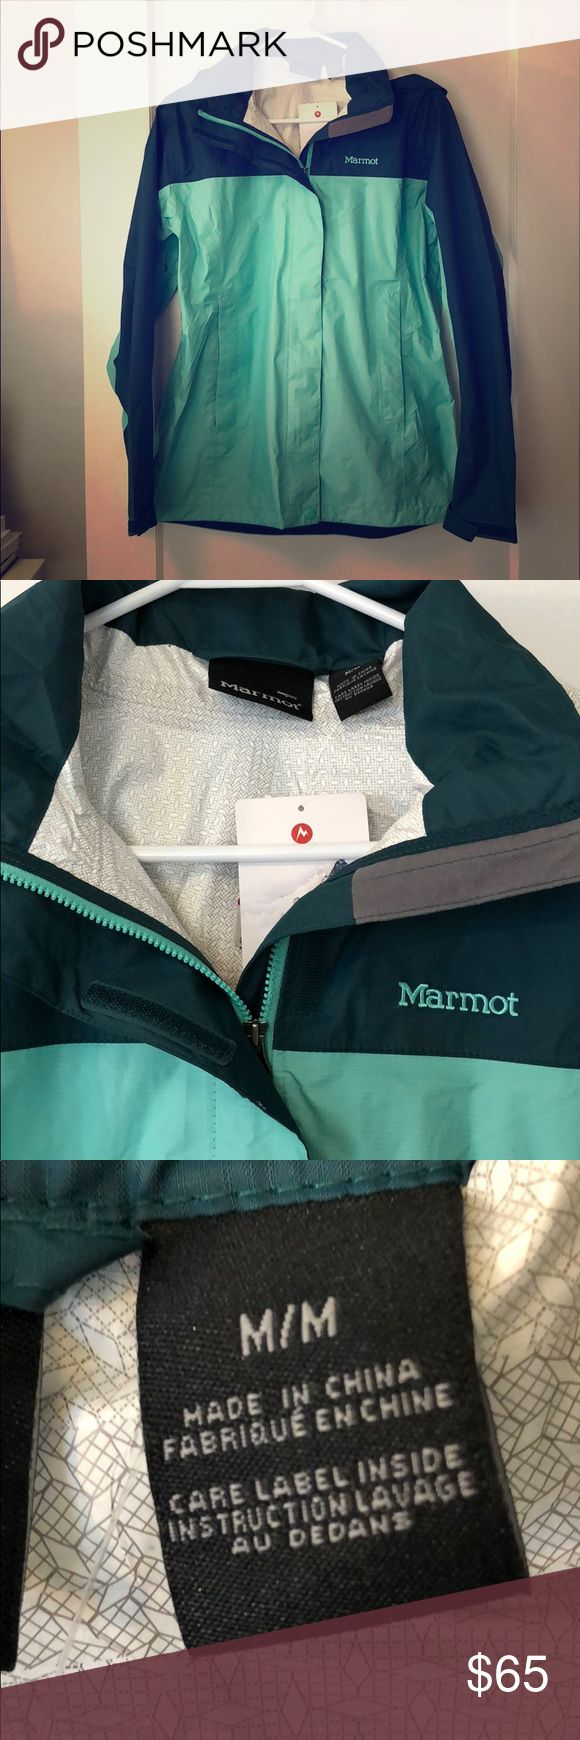 NWT Marmot raincoat Brand new green Marmot raincoat size M. Teal. Marmot Jackets & Coats